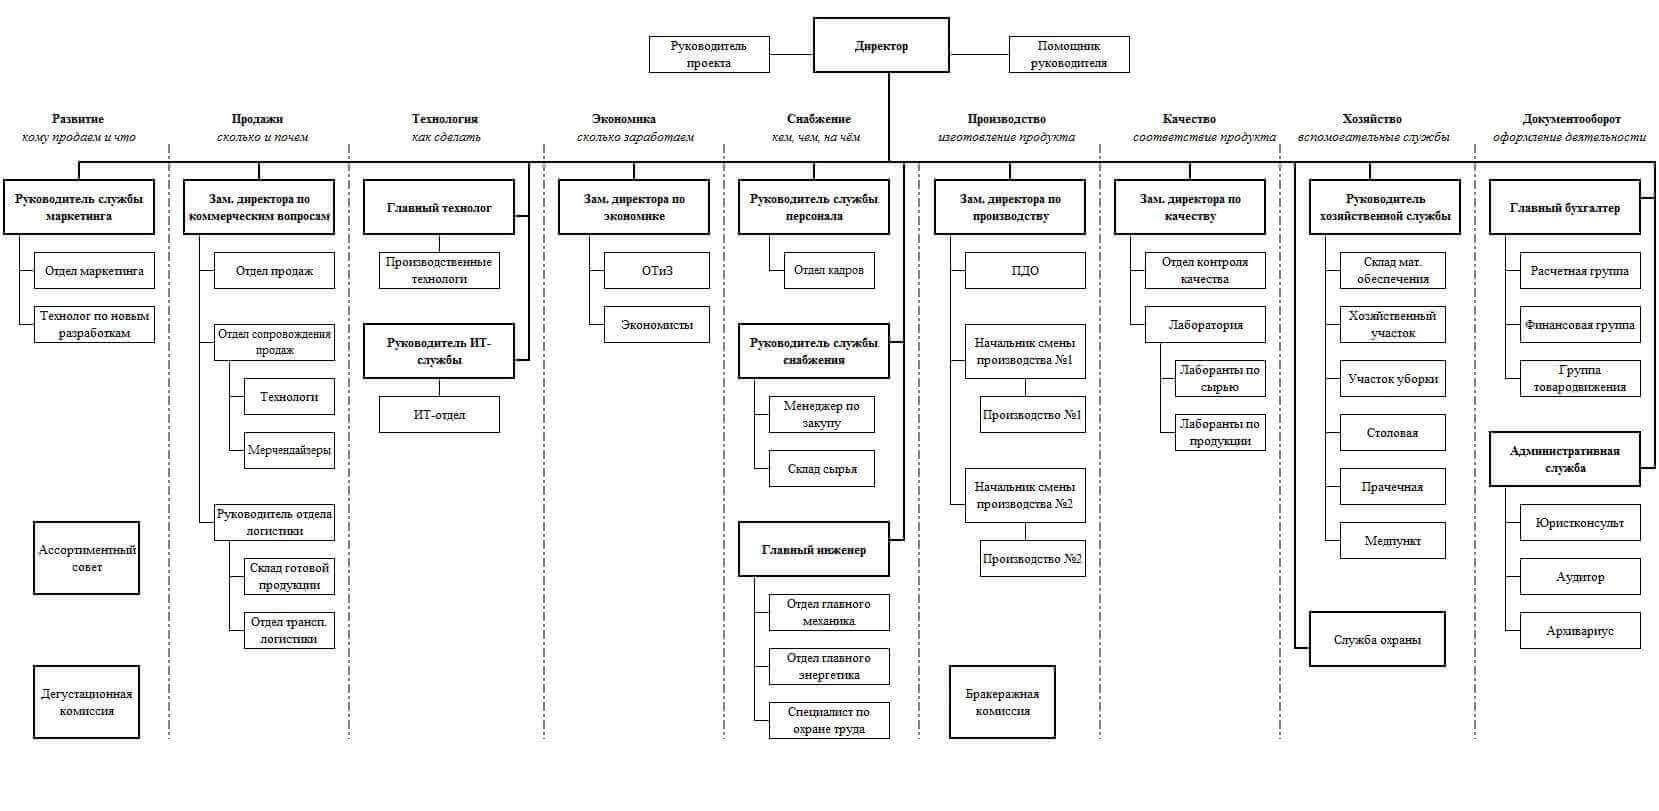 Организационно производственная структура предприятия схема фото 48